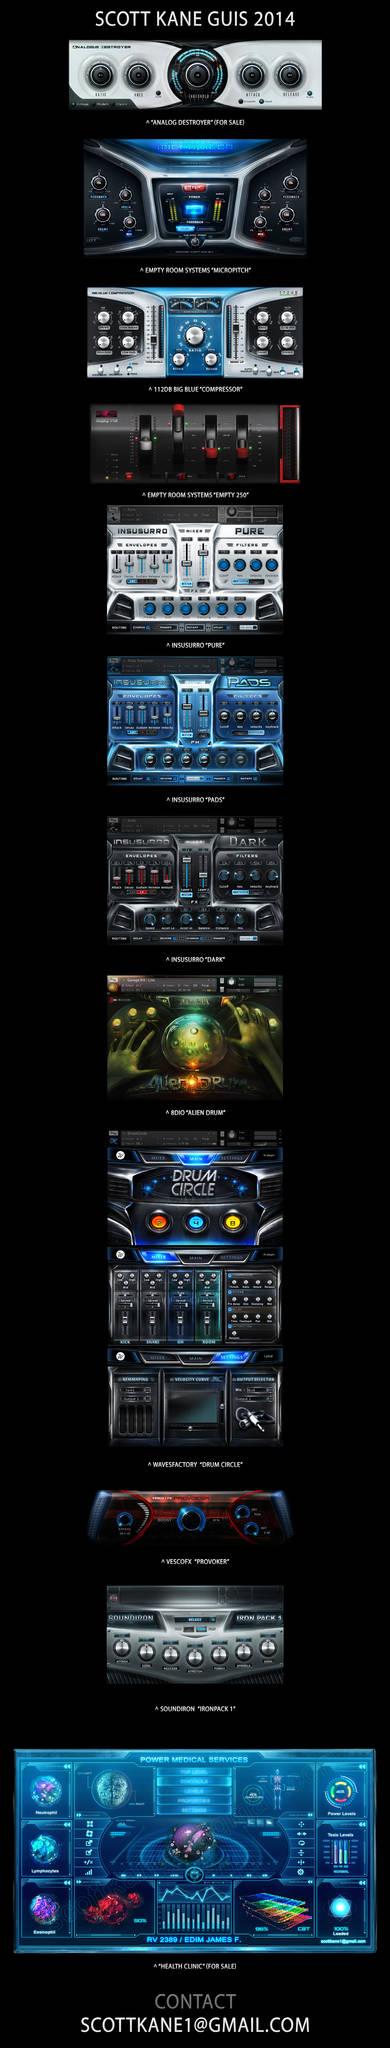 Extreme User Interface Design 2016 by Scott-Kane